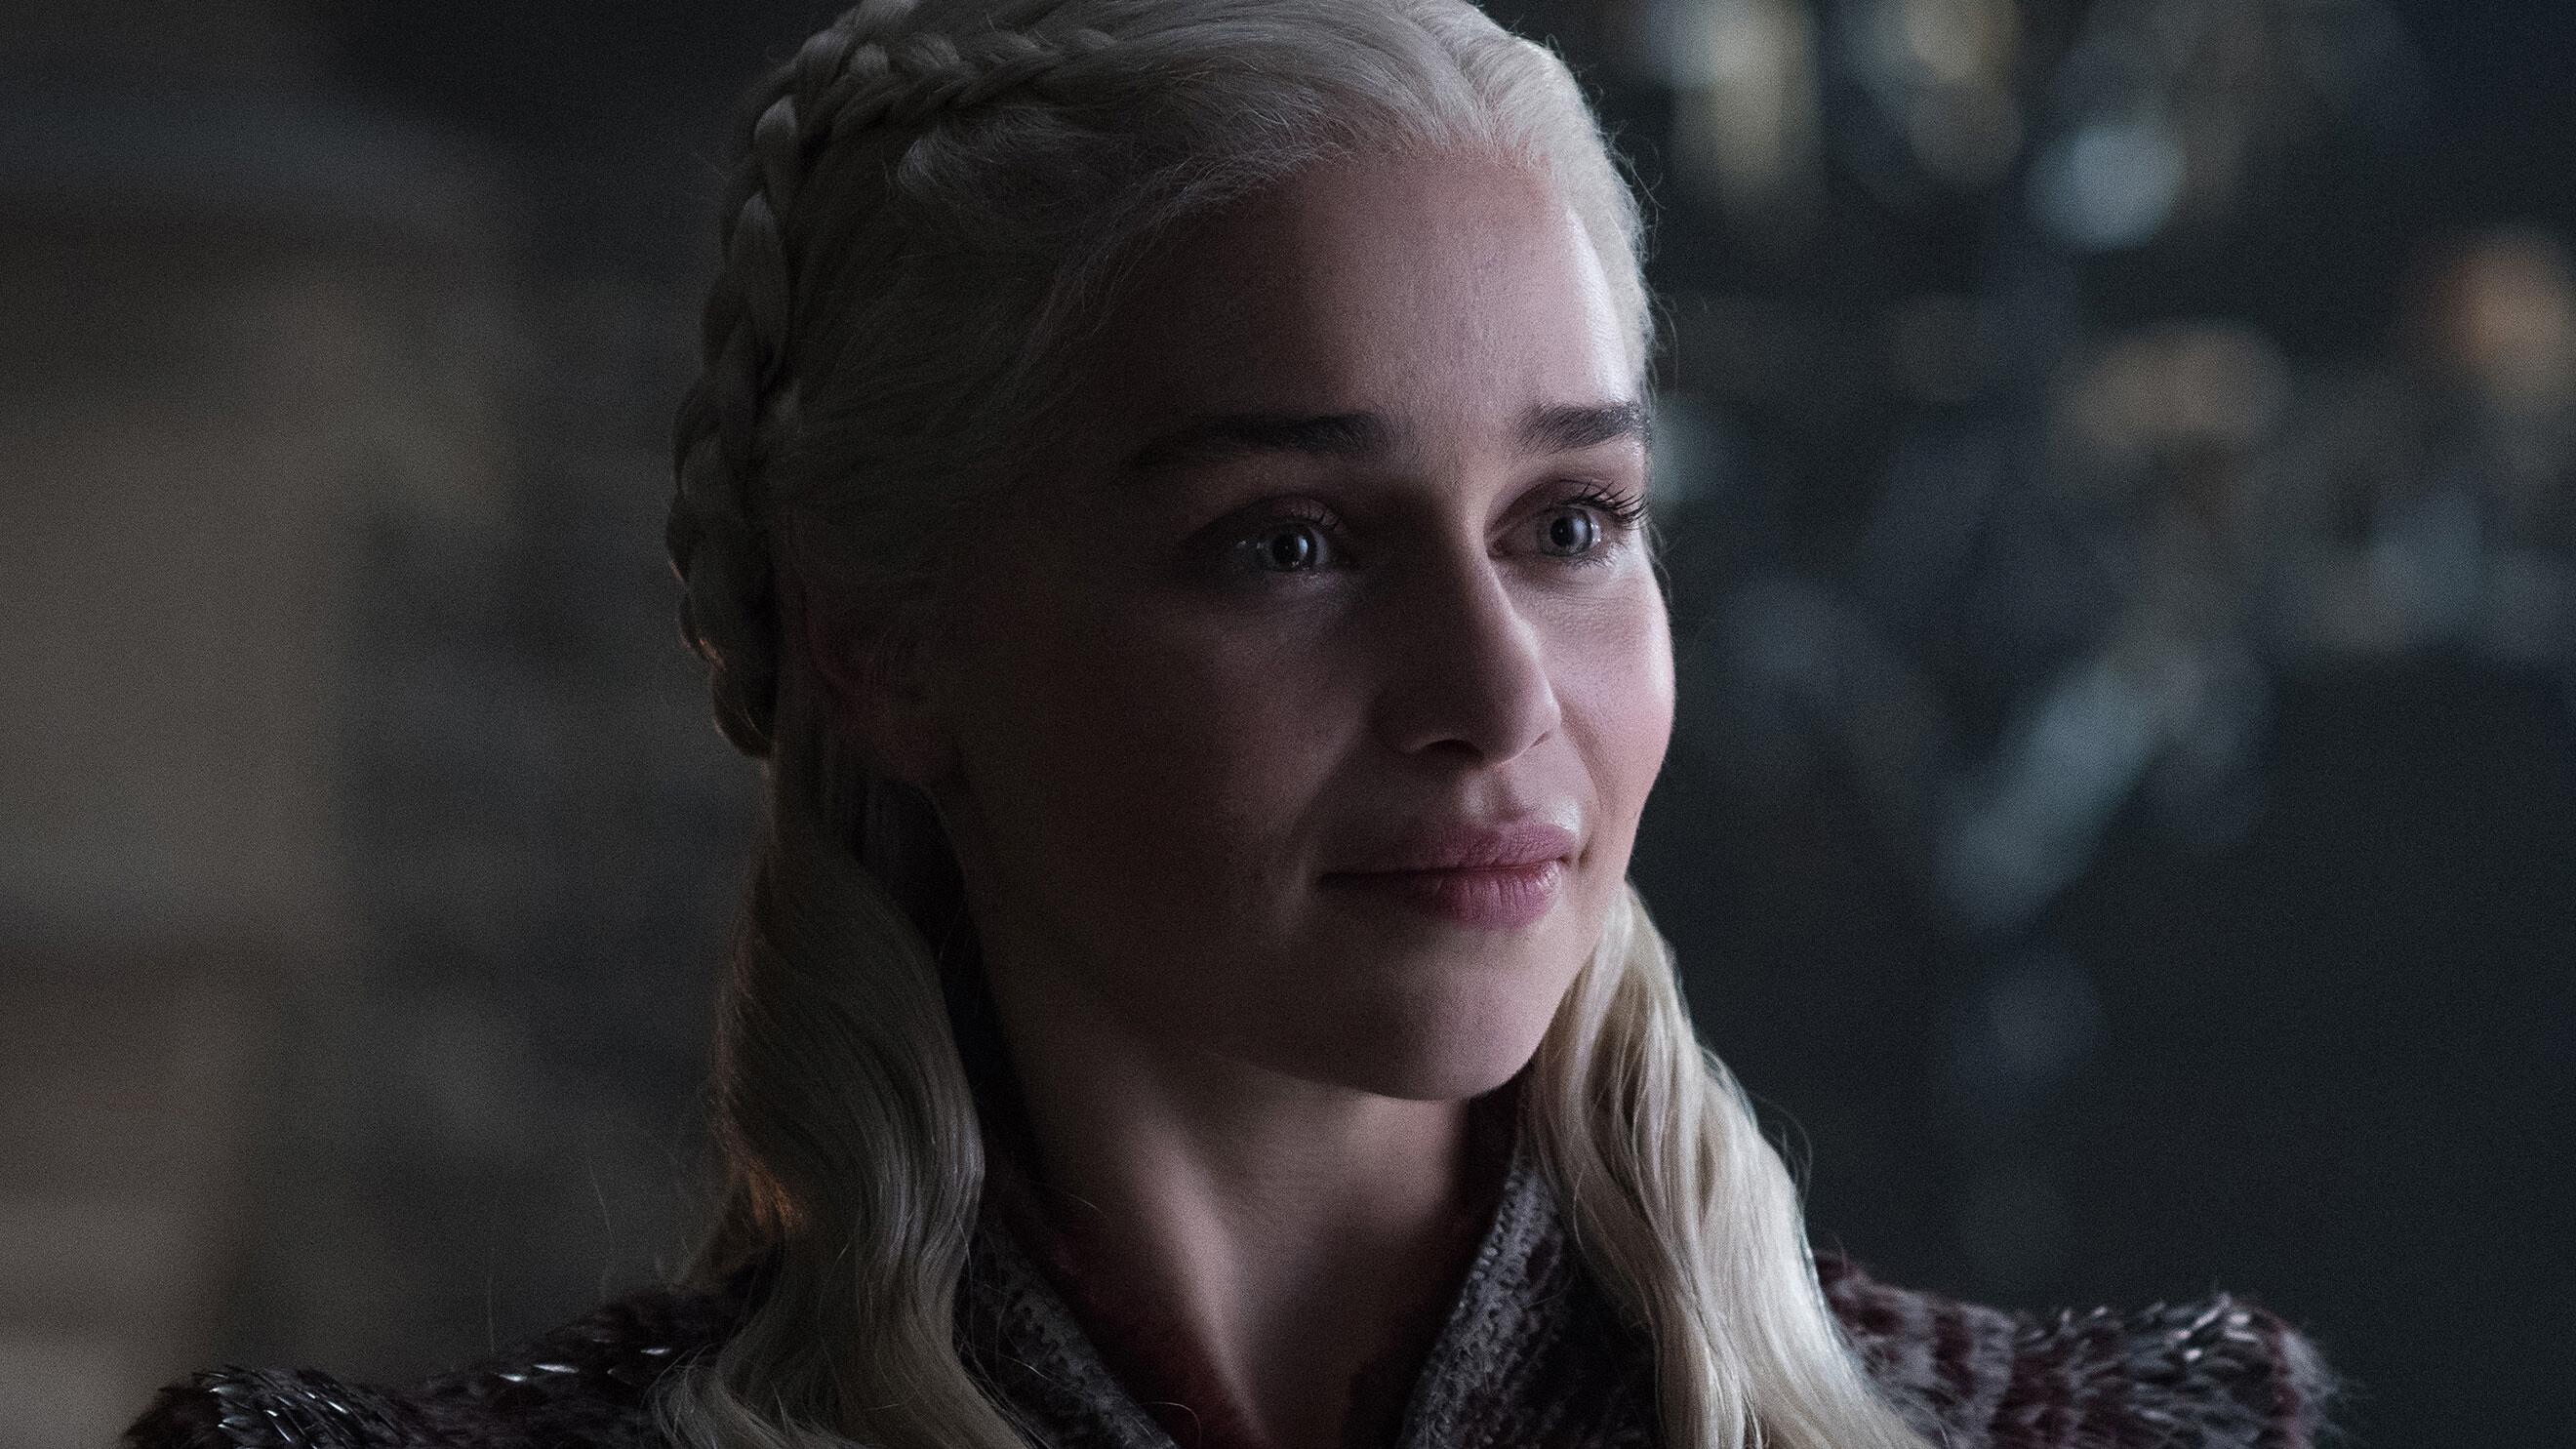 Emilia Clarke As Daenerys Targaryen Game Of Thrones Season 8 Hd